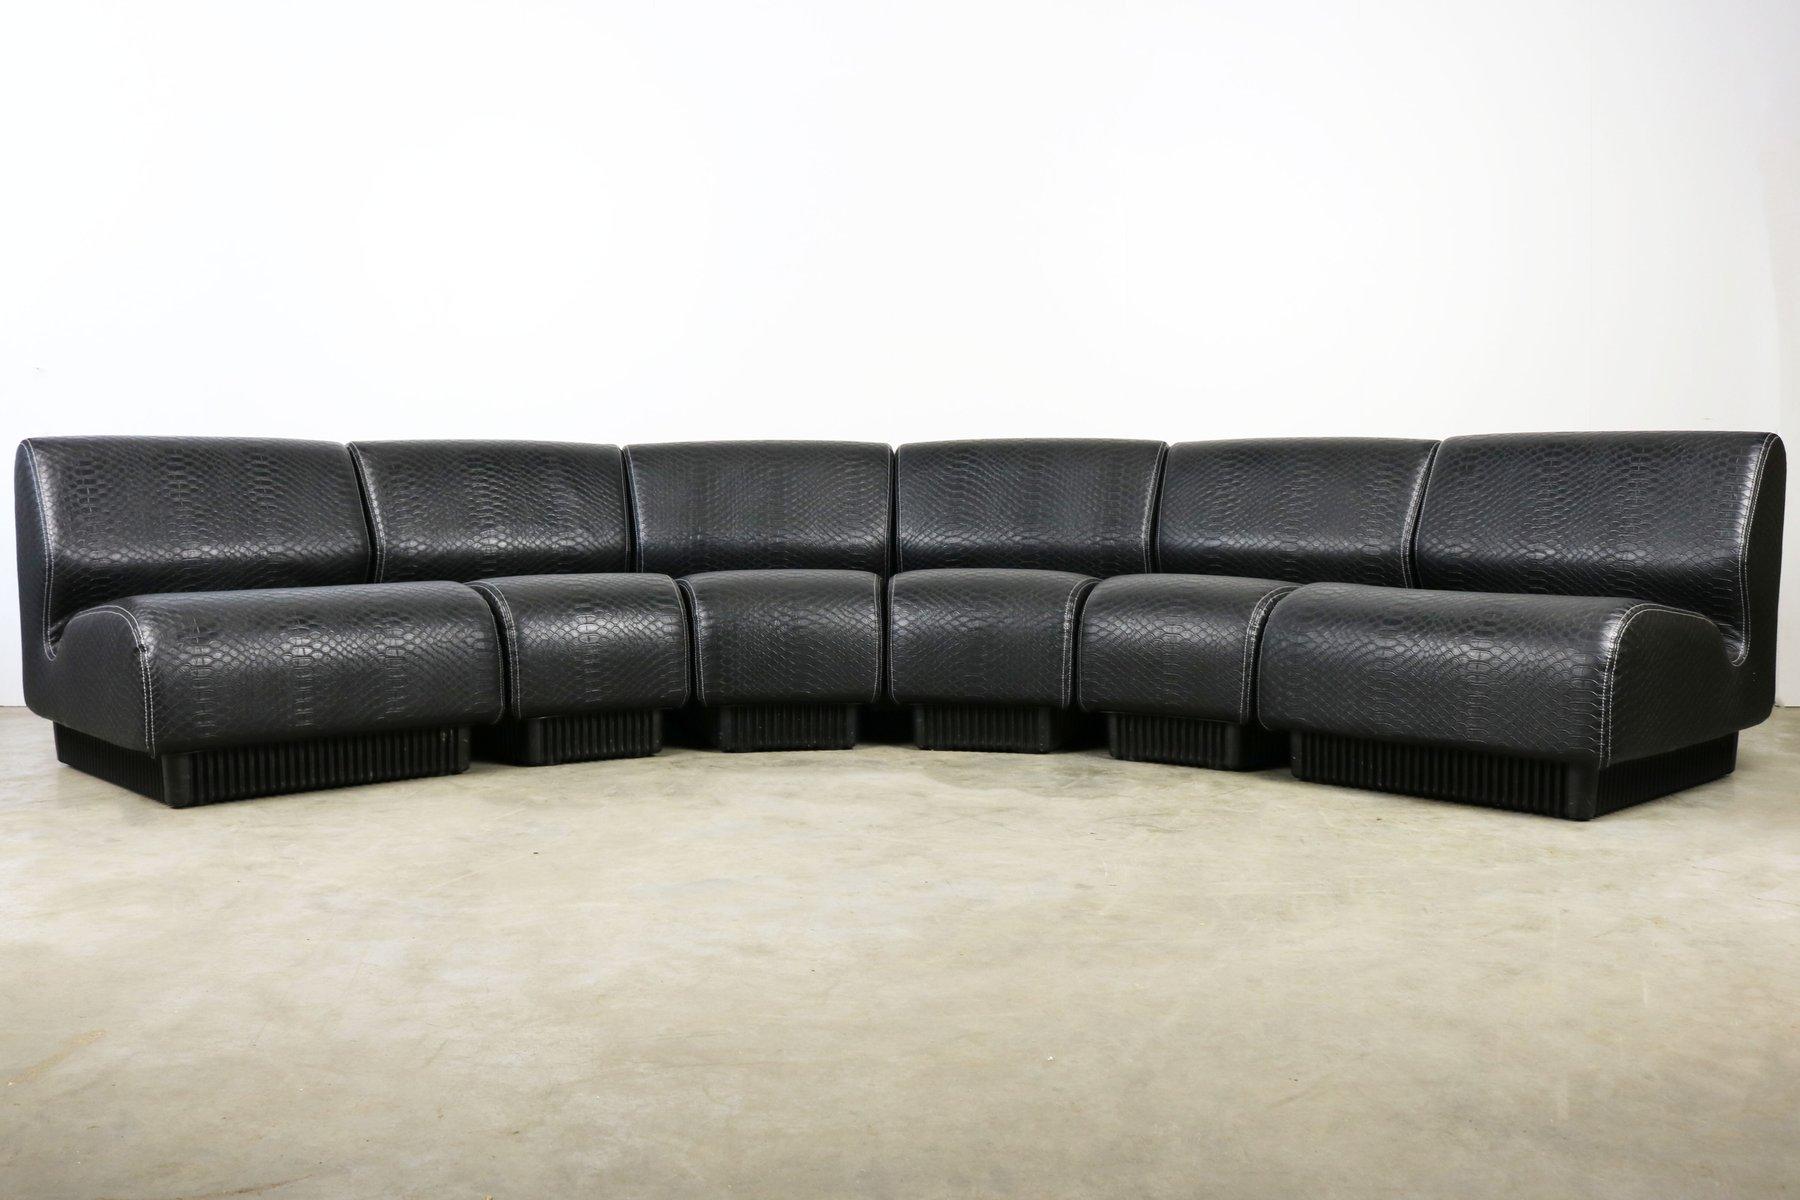 Mid Century Black Snakeskin Modular Sofa By Don Chadwick For Herman Miller,  1970s